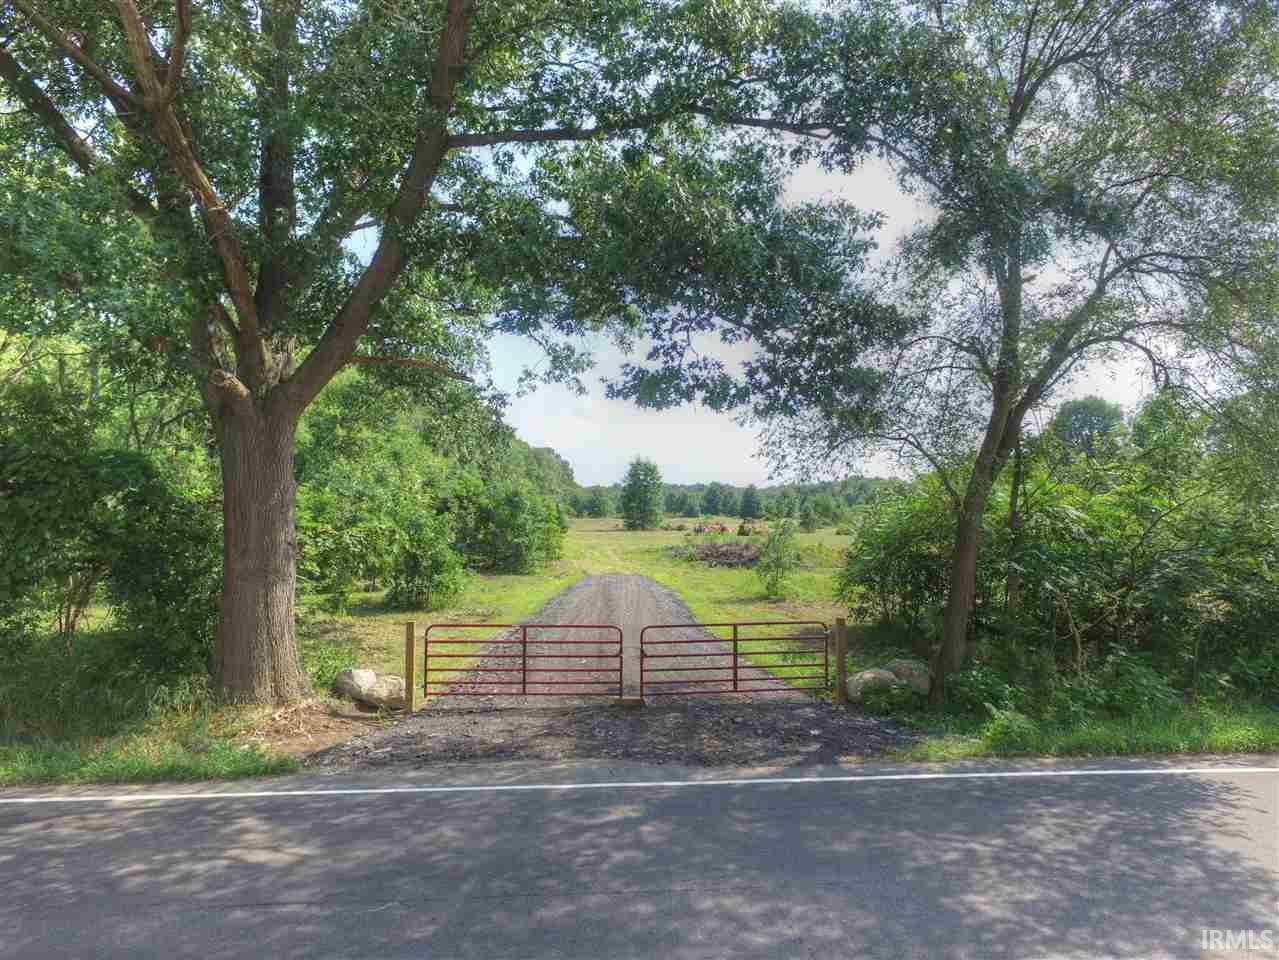 County Road 106 Elkhart, IN 46514